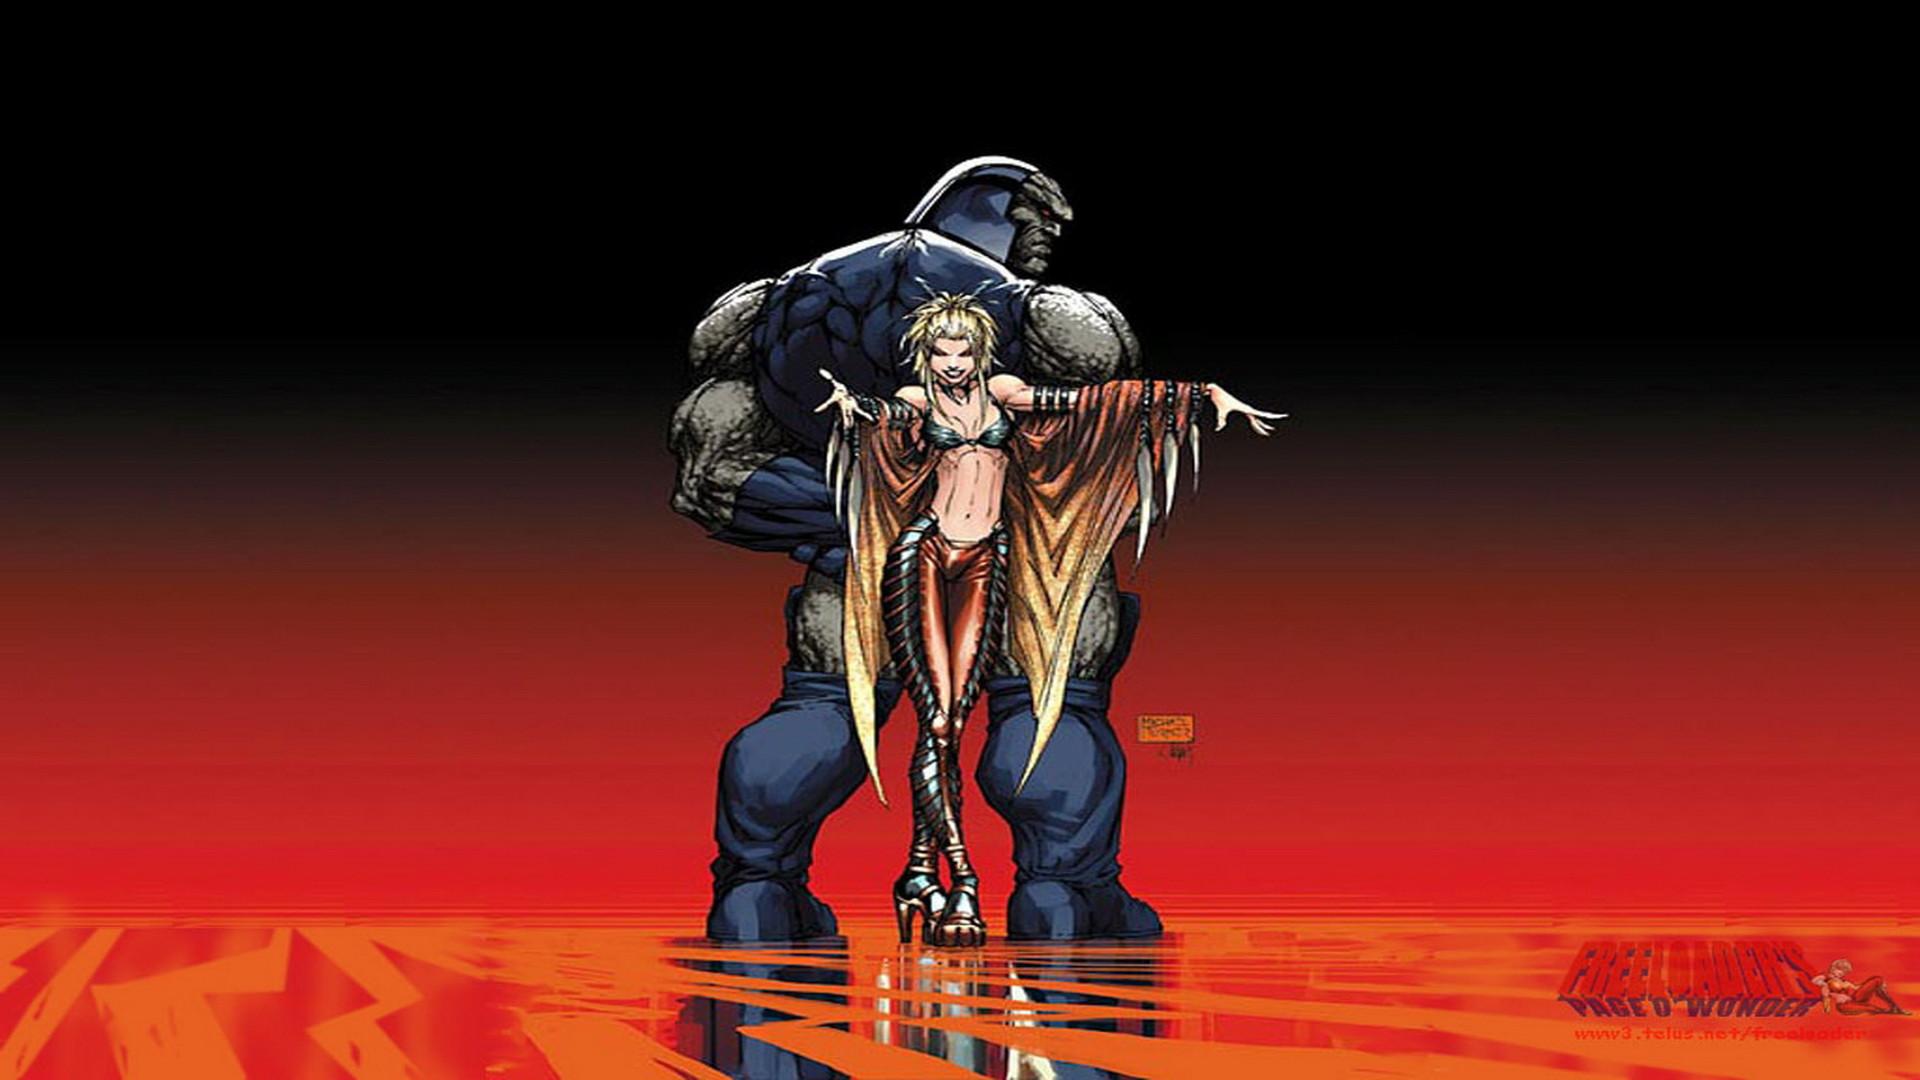 Darkseid-dc-comics-3977526-1024-768, Wallpaper HD, Desktop